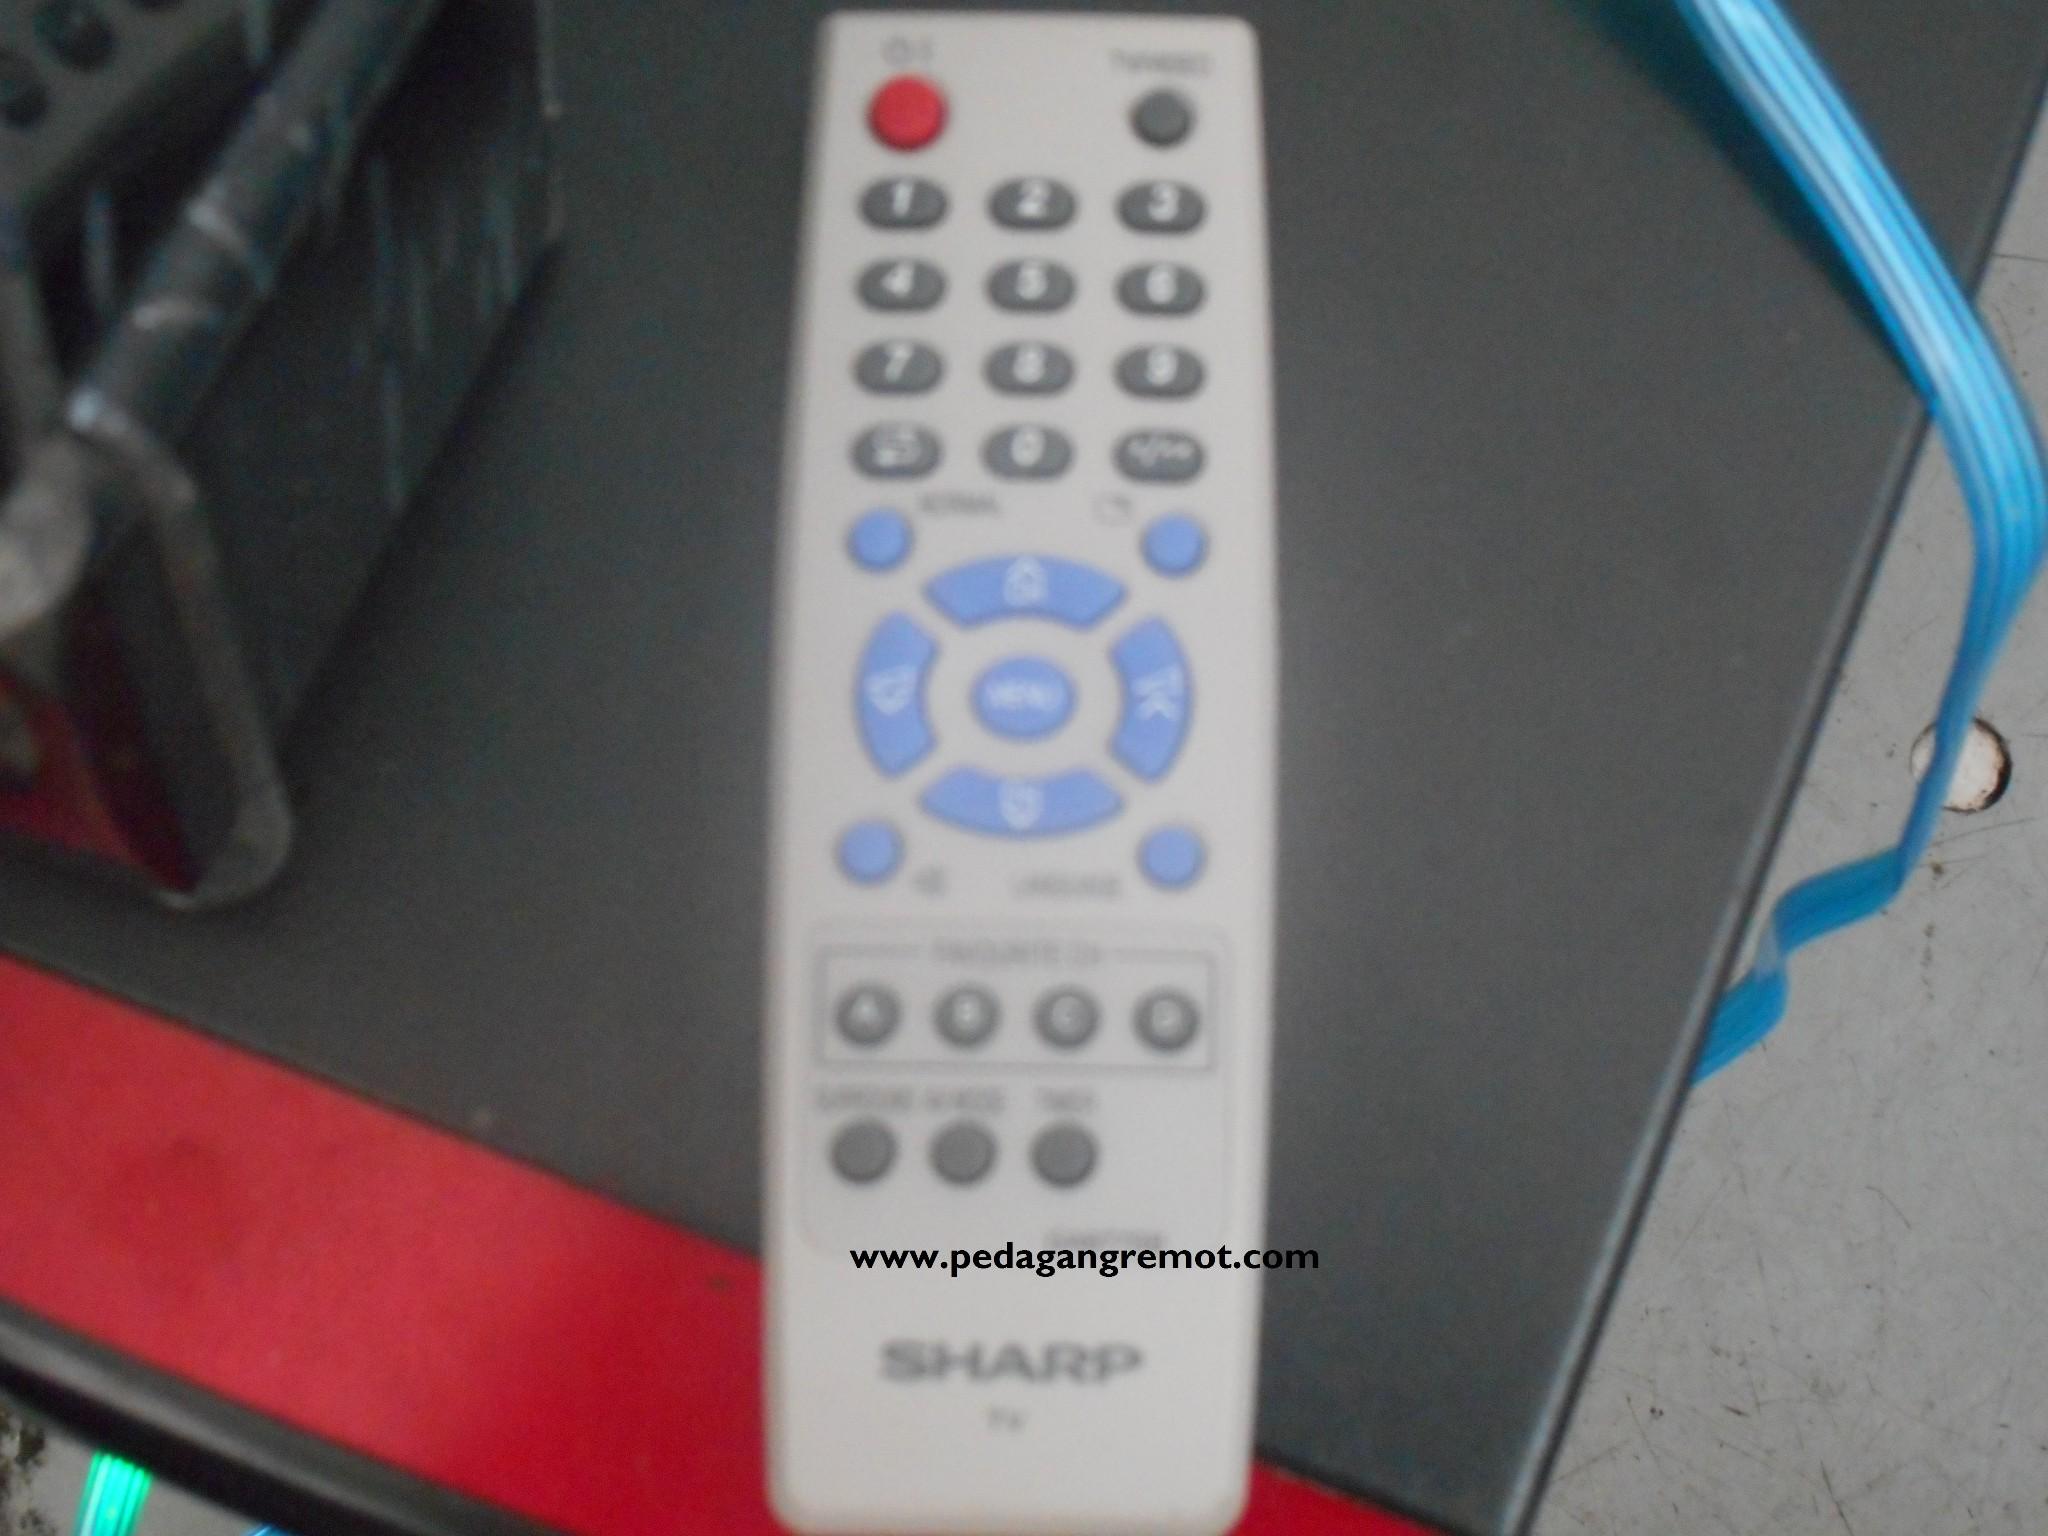 Jual Remot Remote TV SHARP Tabung CRT Original GA877SB Pedagang Remot